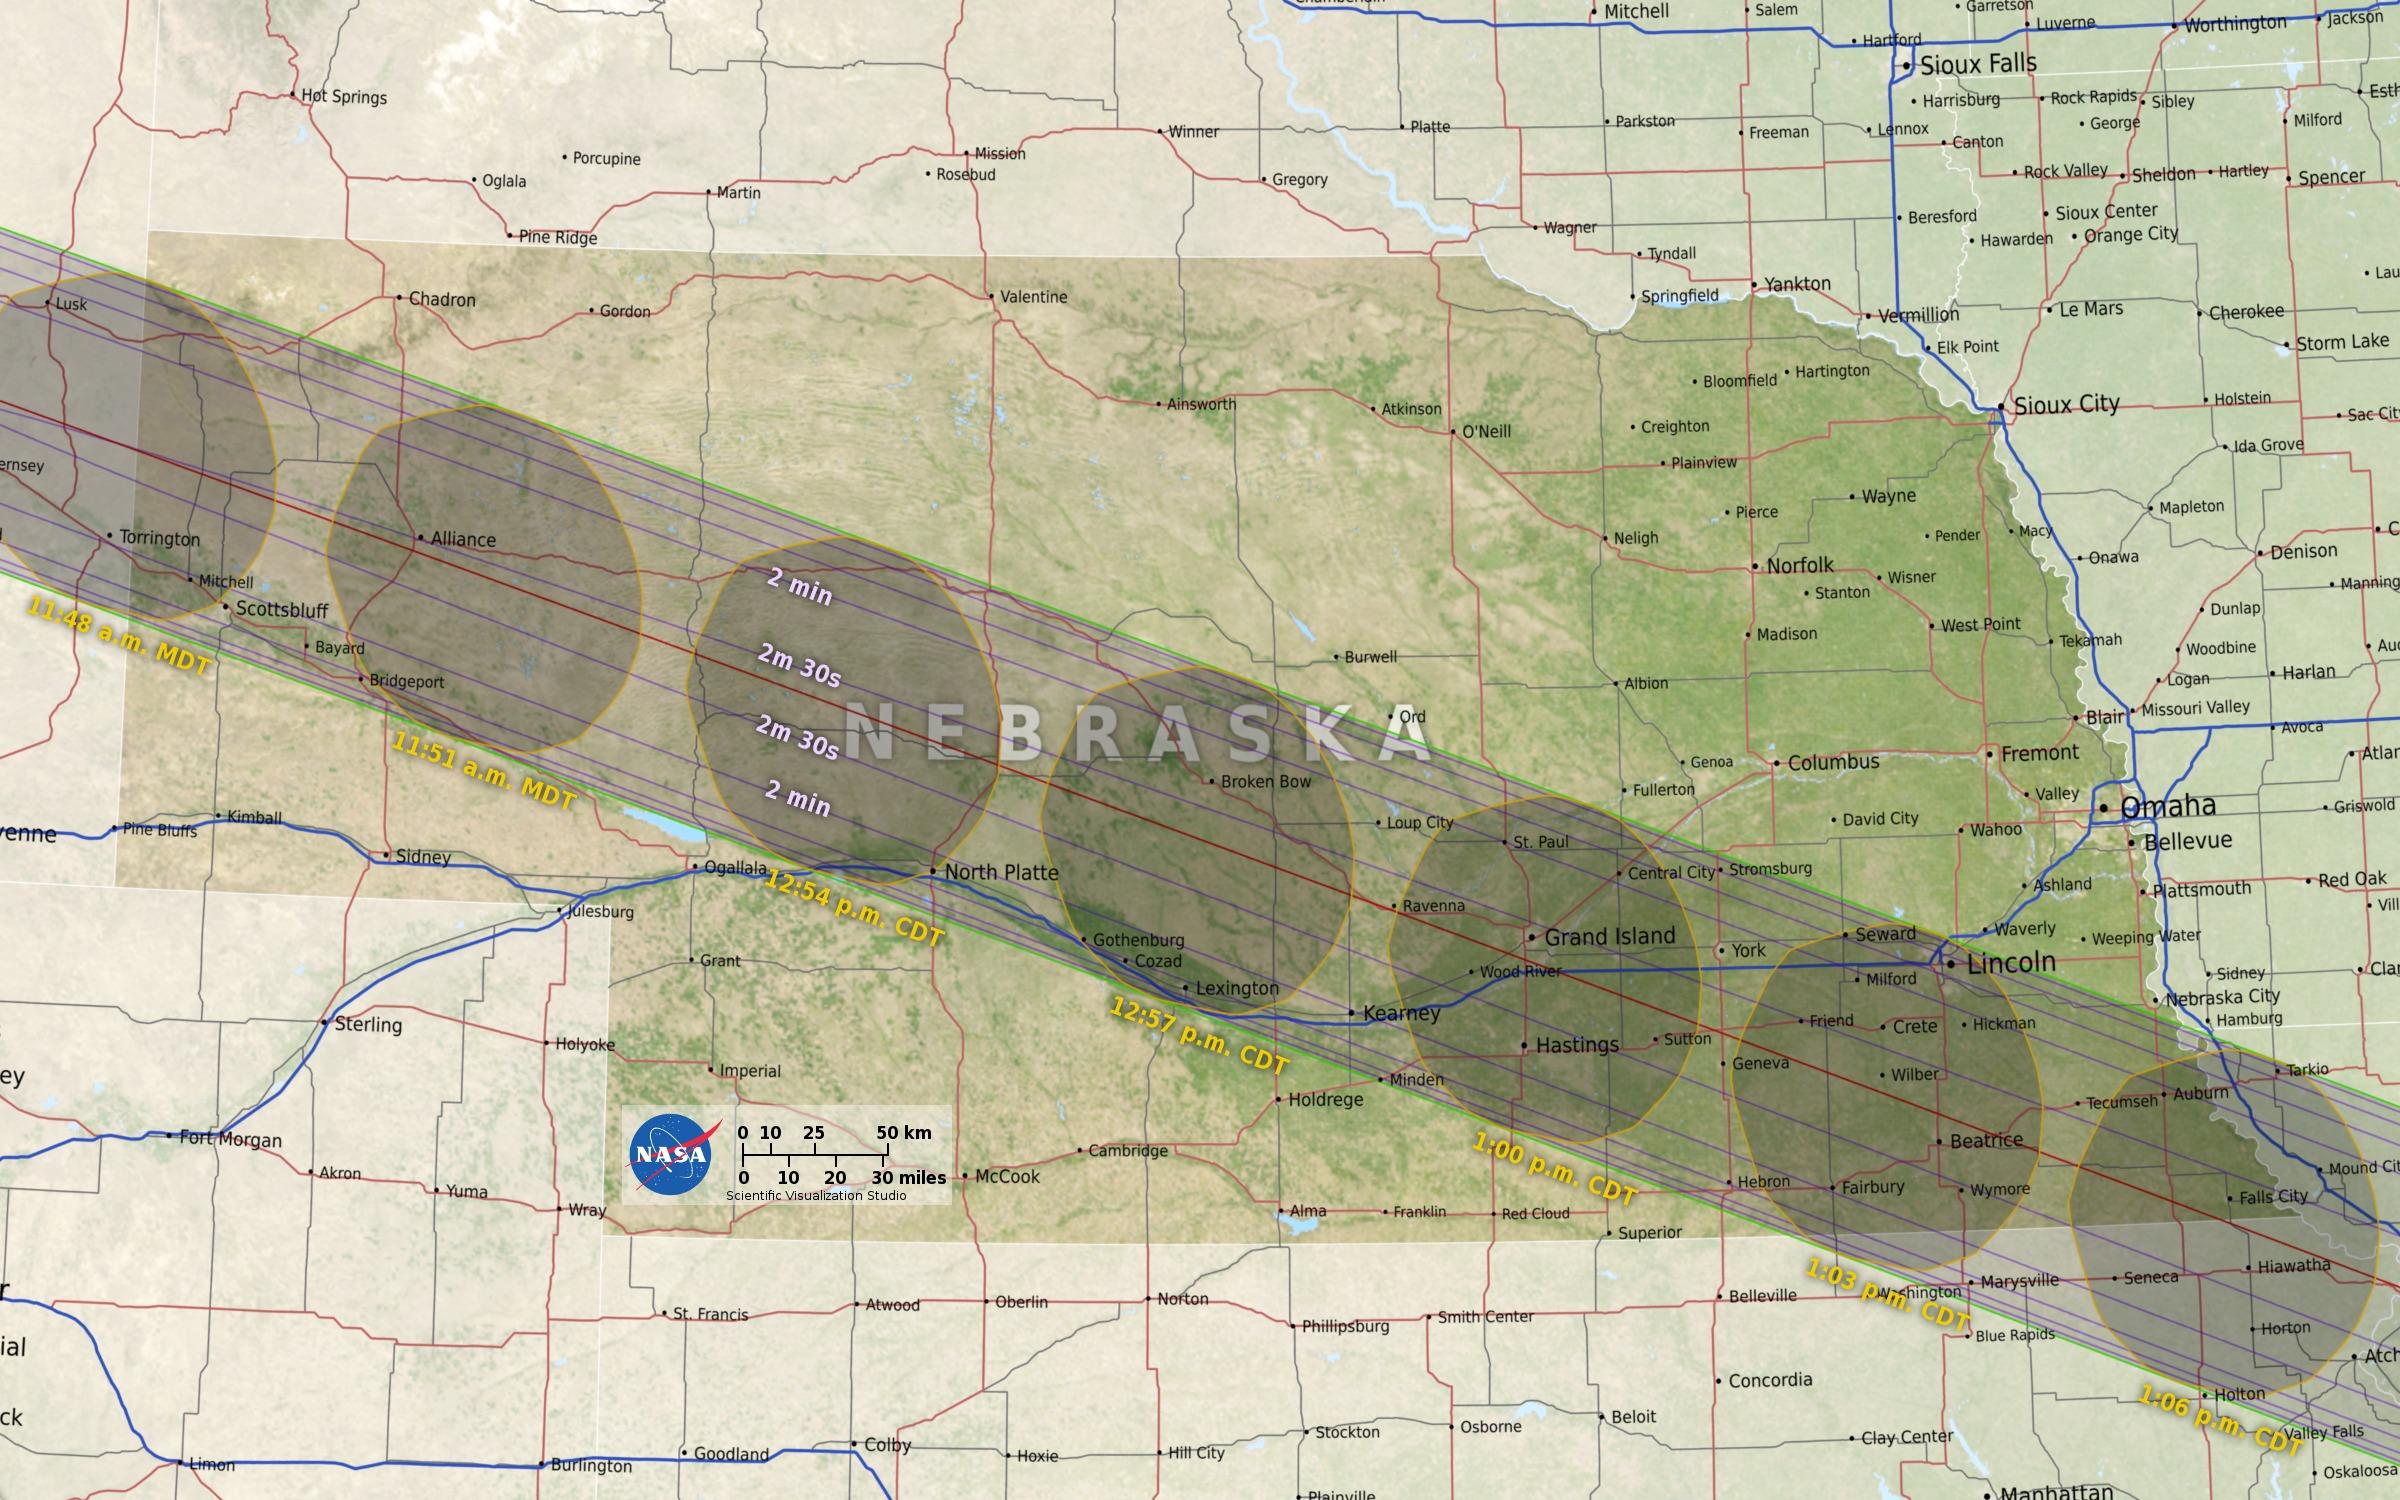 Eclipse South Dakota SW Minnesota And NW Iowa KELOLAND TV - Total eclipse us coverage map